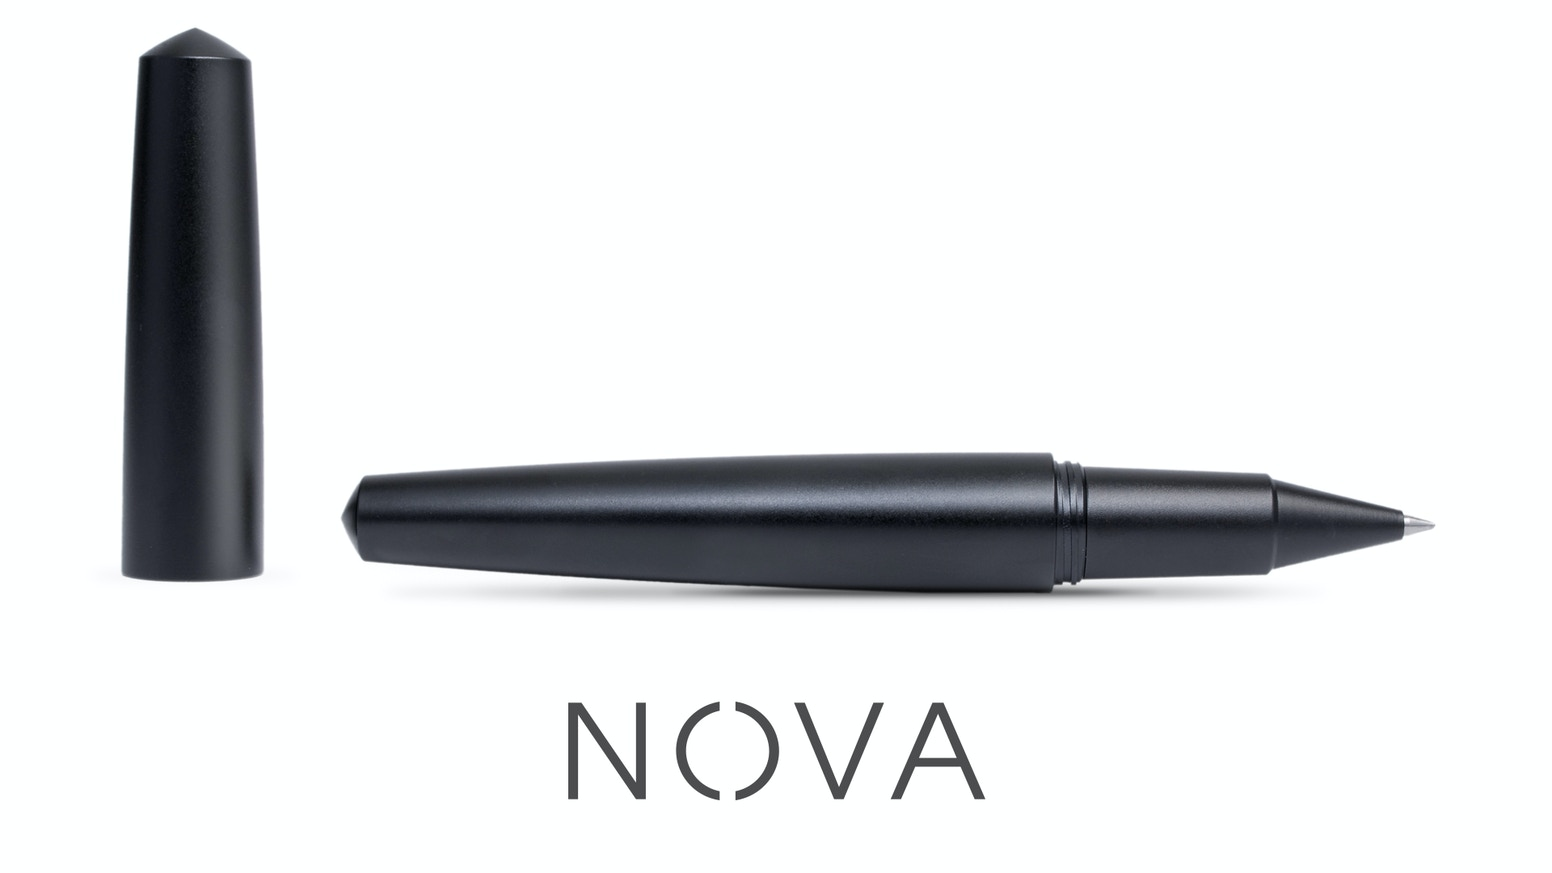 Solid Titanium, Brass or Aluminium Pen. Minimalist Design. The Ultimate Everyday Carry Writing Instrument.